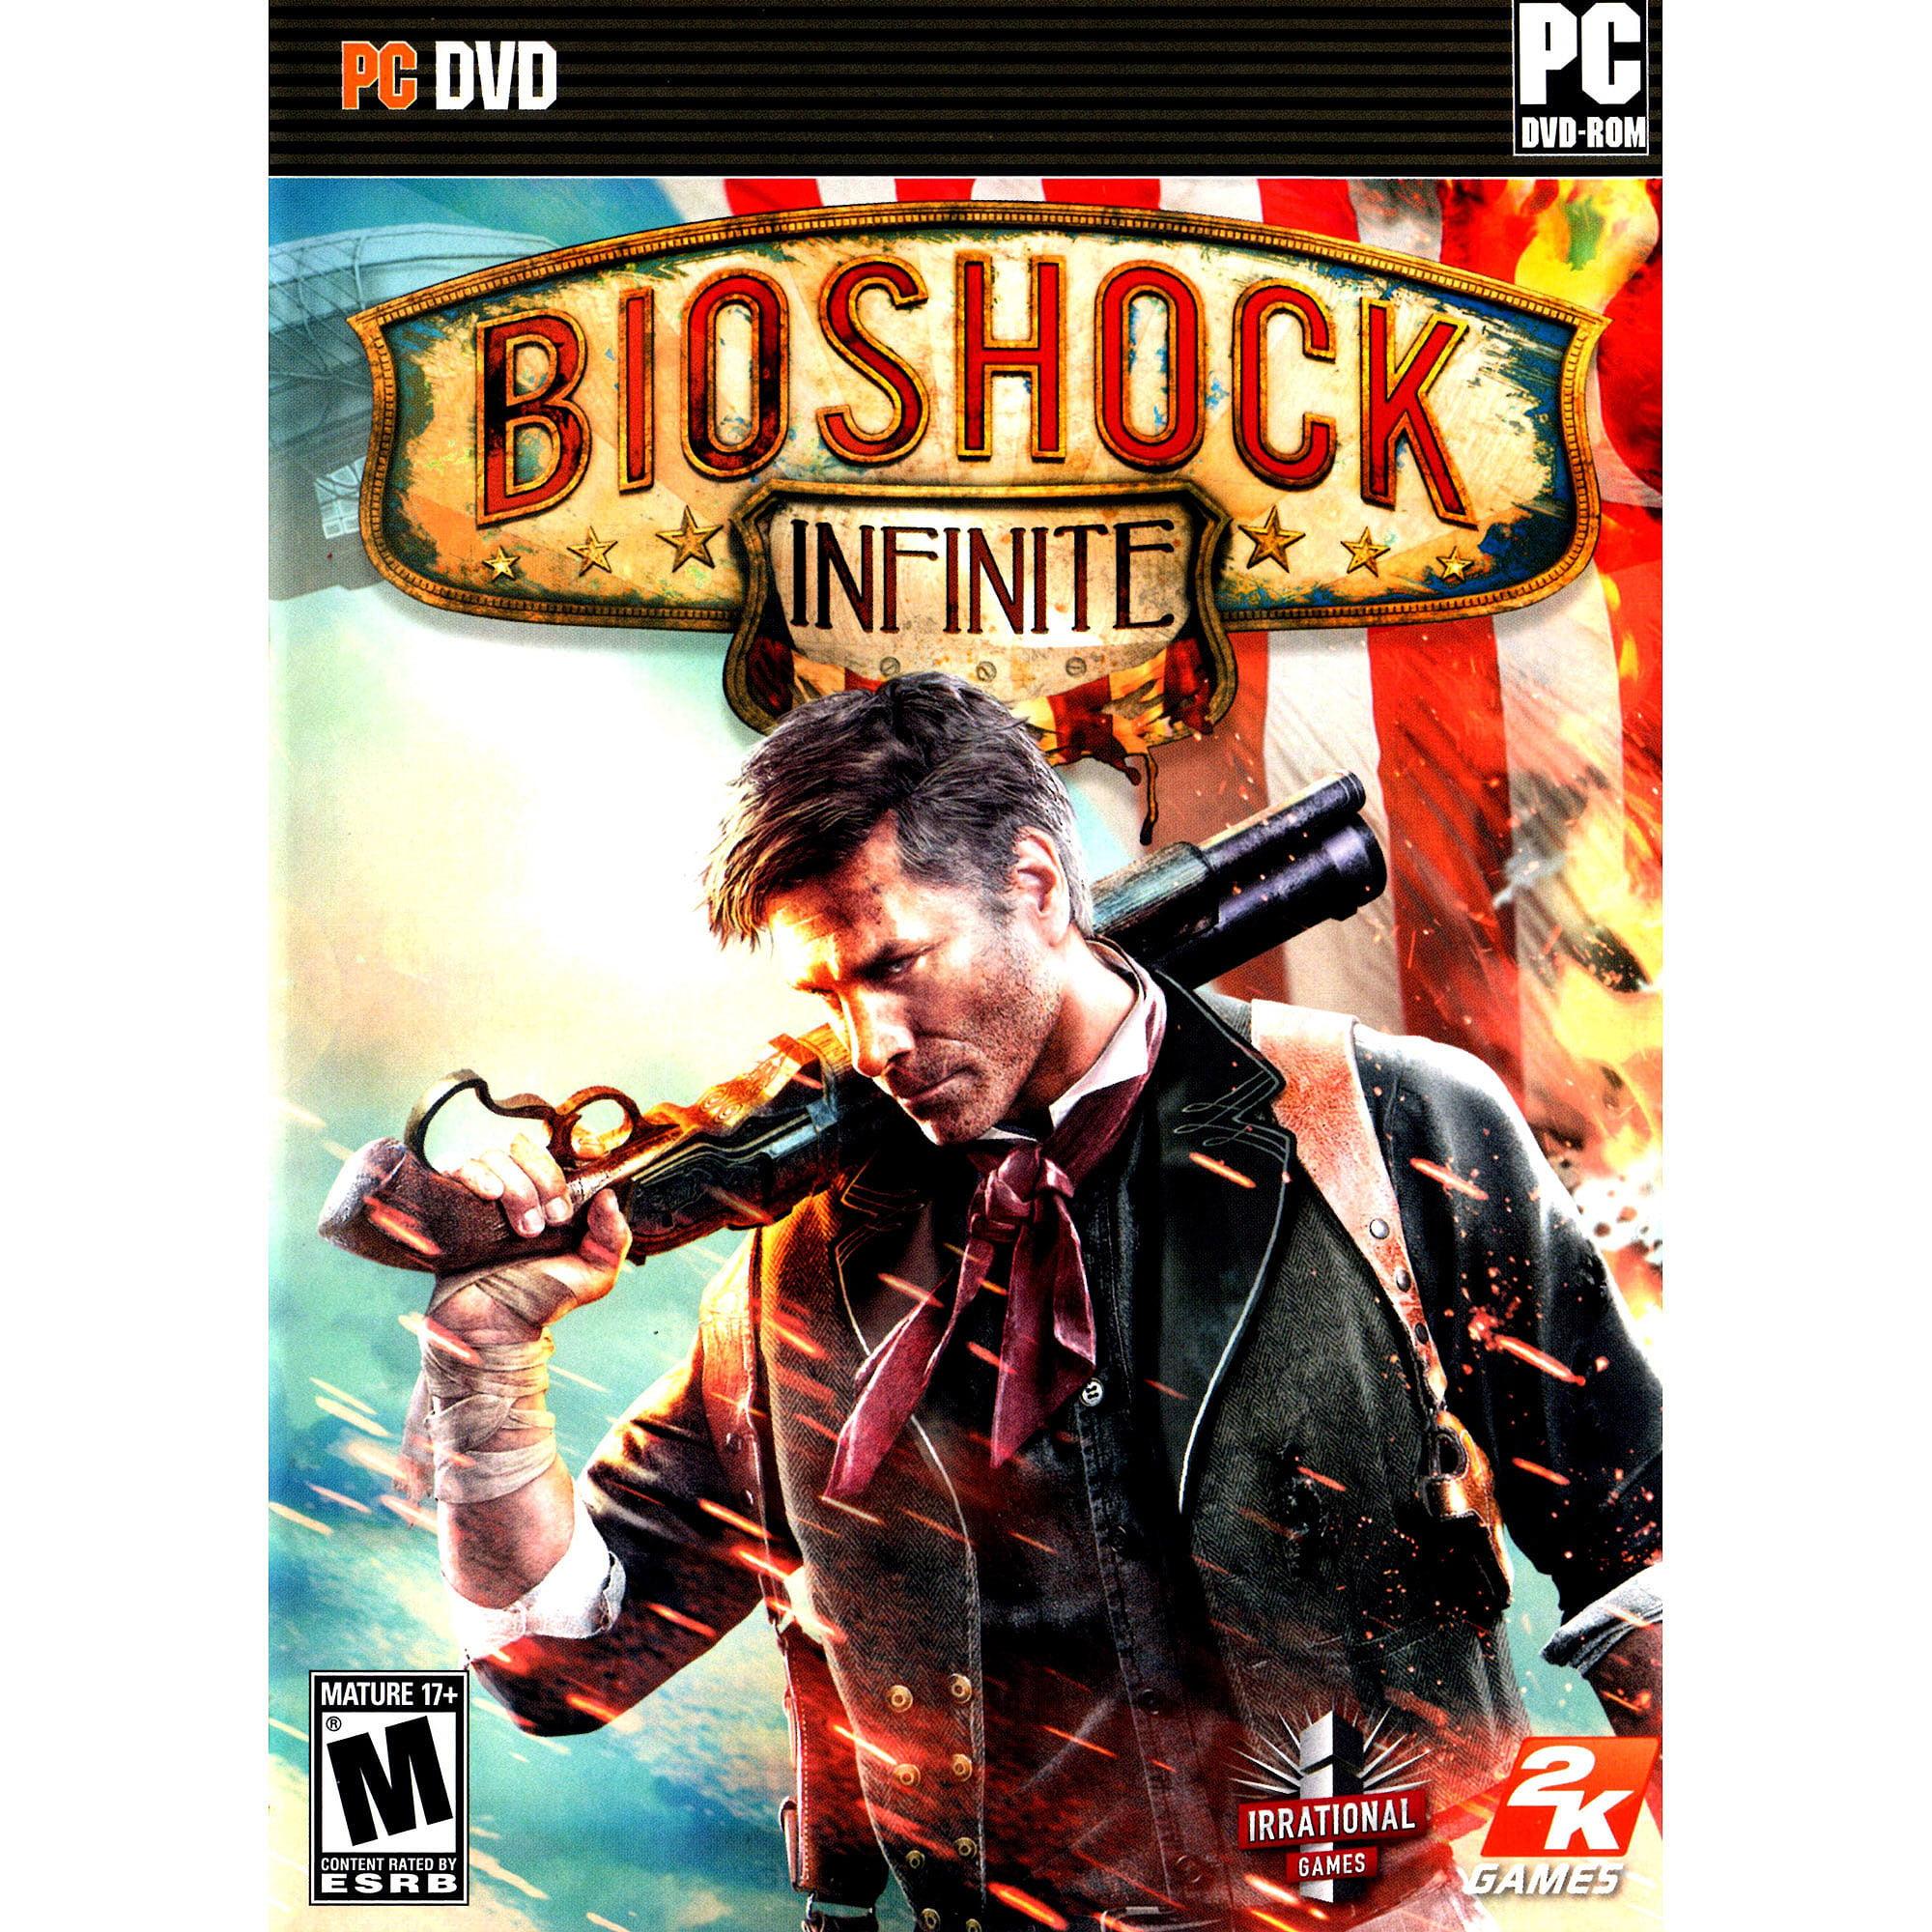 BioShock Infinite (Digital Code) (PC)